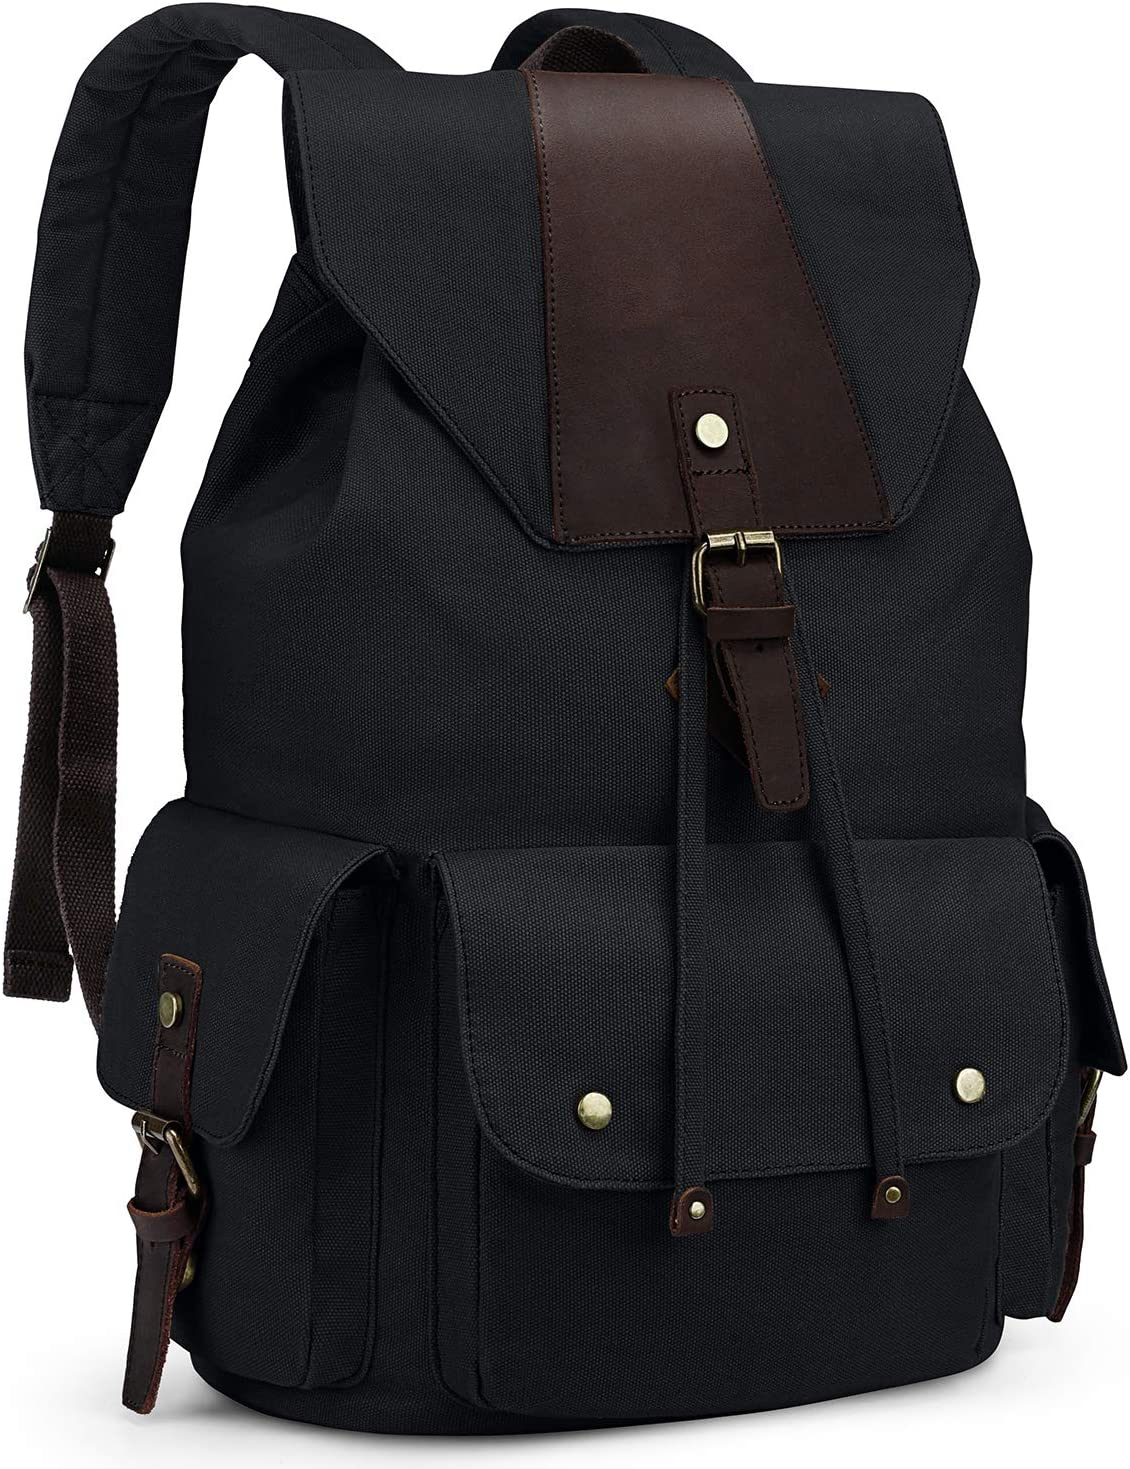 Kattee Canvas Backpack for Men Women Casual Leather Travel Backpack Hiking Backpack School Rucksack Black